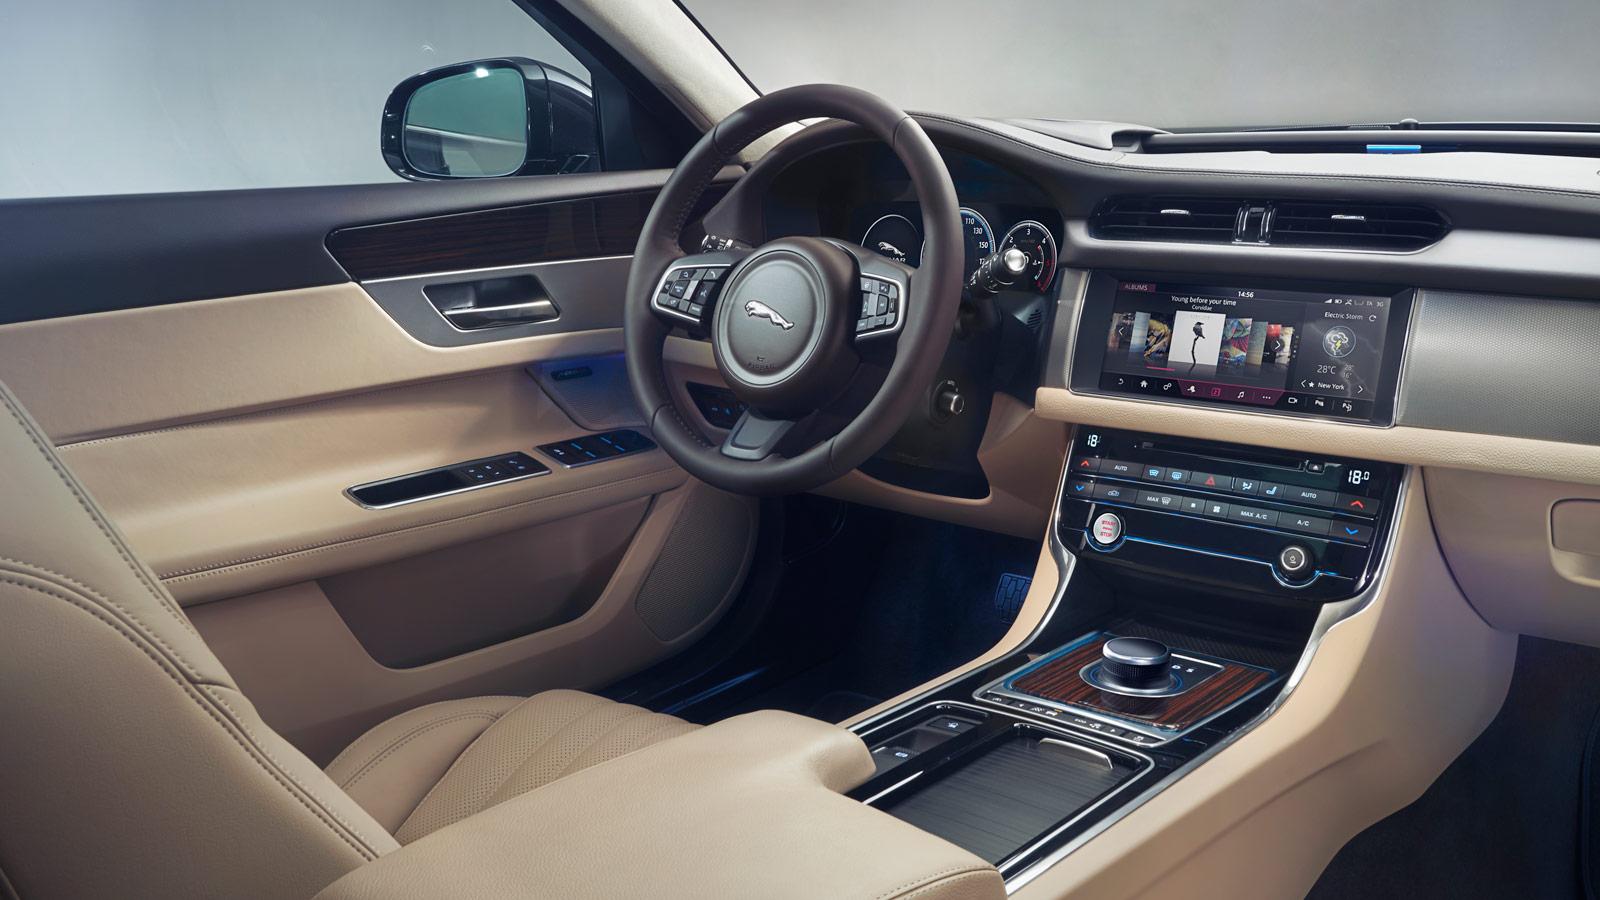 Jaguar XF 2.0d (180) R-Sport AWD image 20